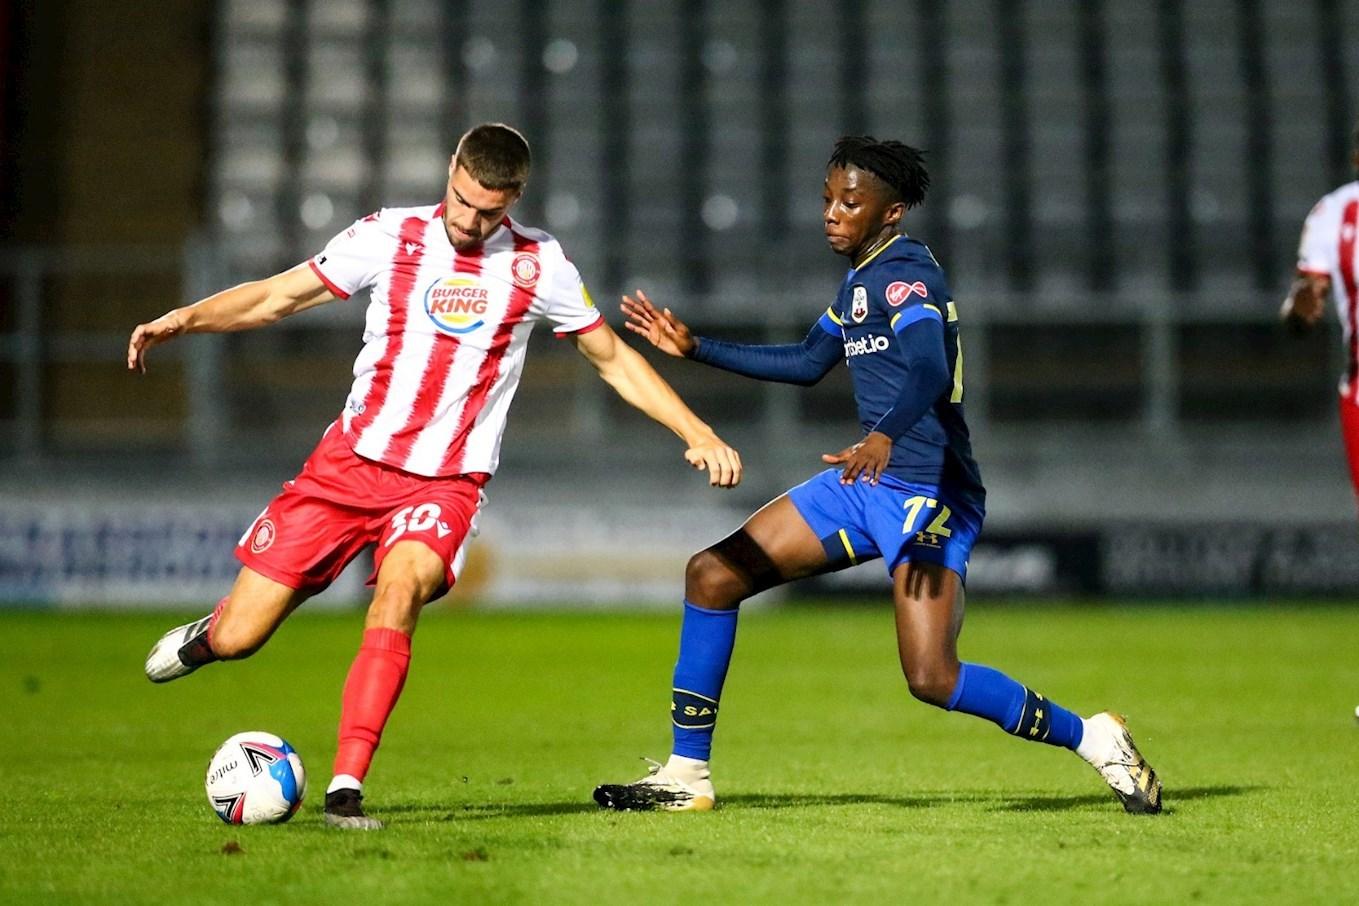 Fernandez joins Oxford City on loan - News - Stevenage Football Club